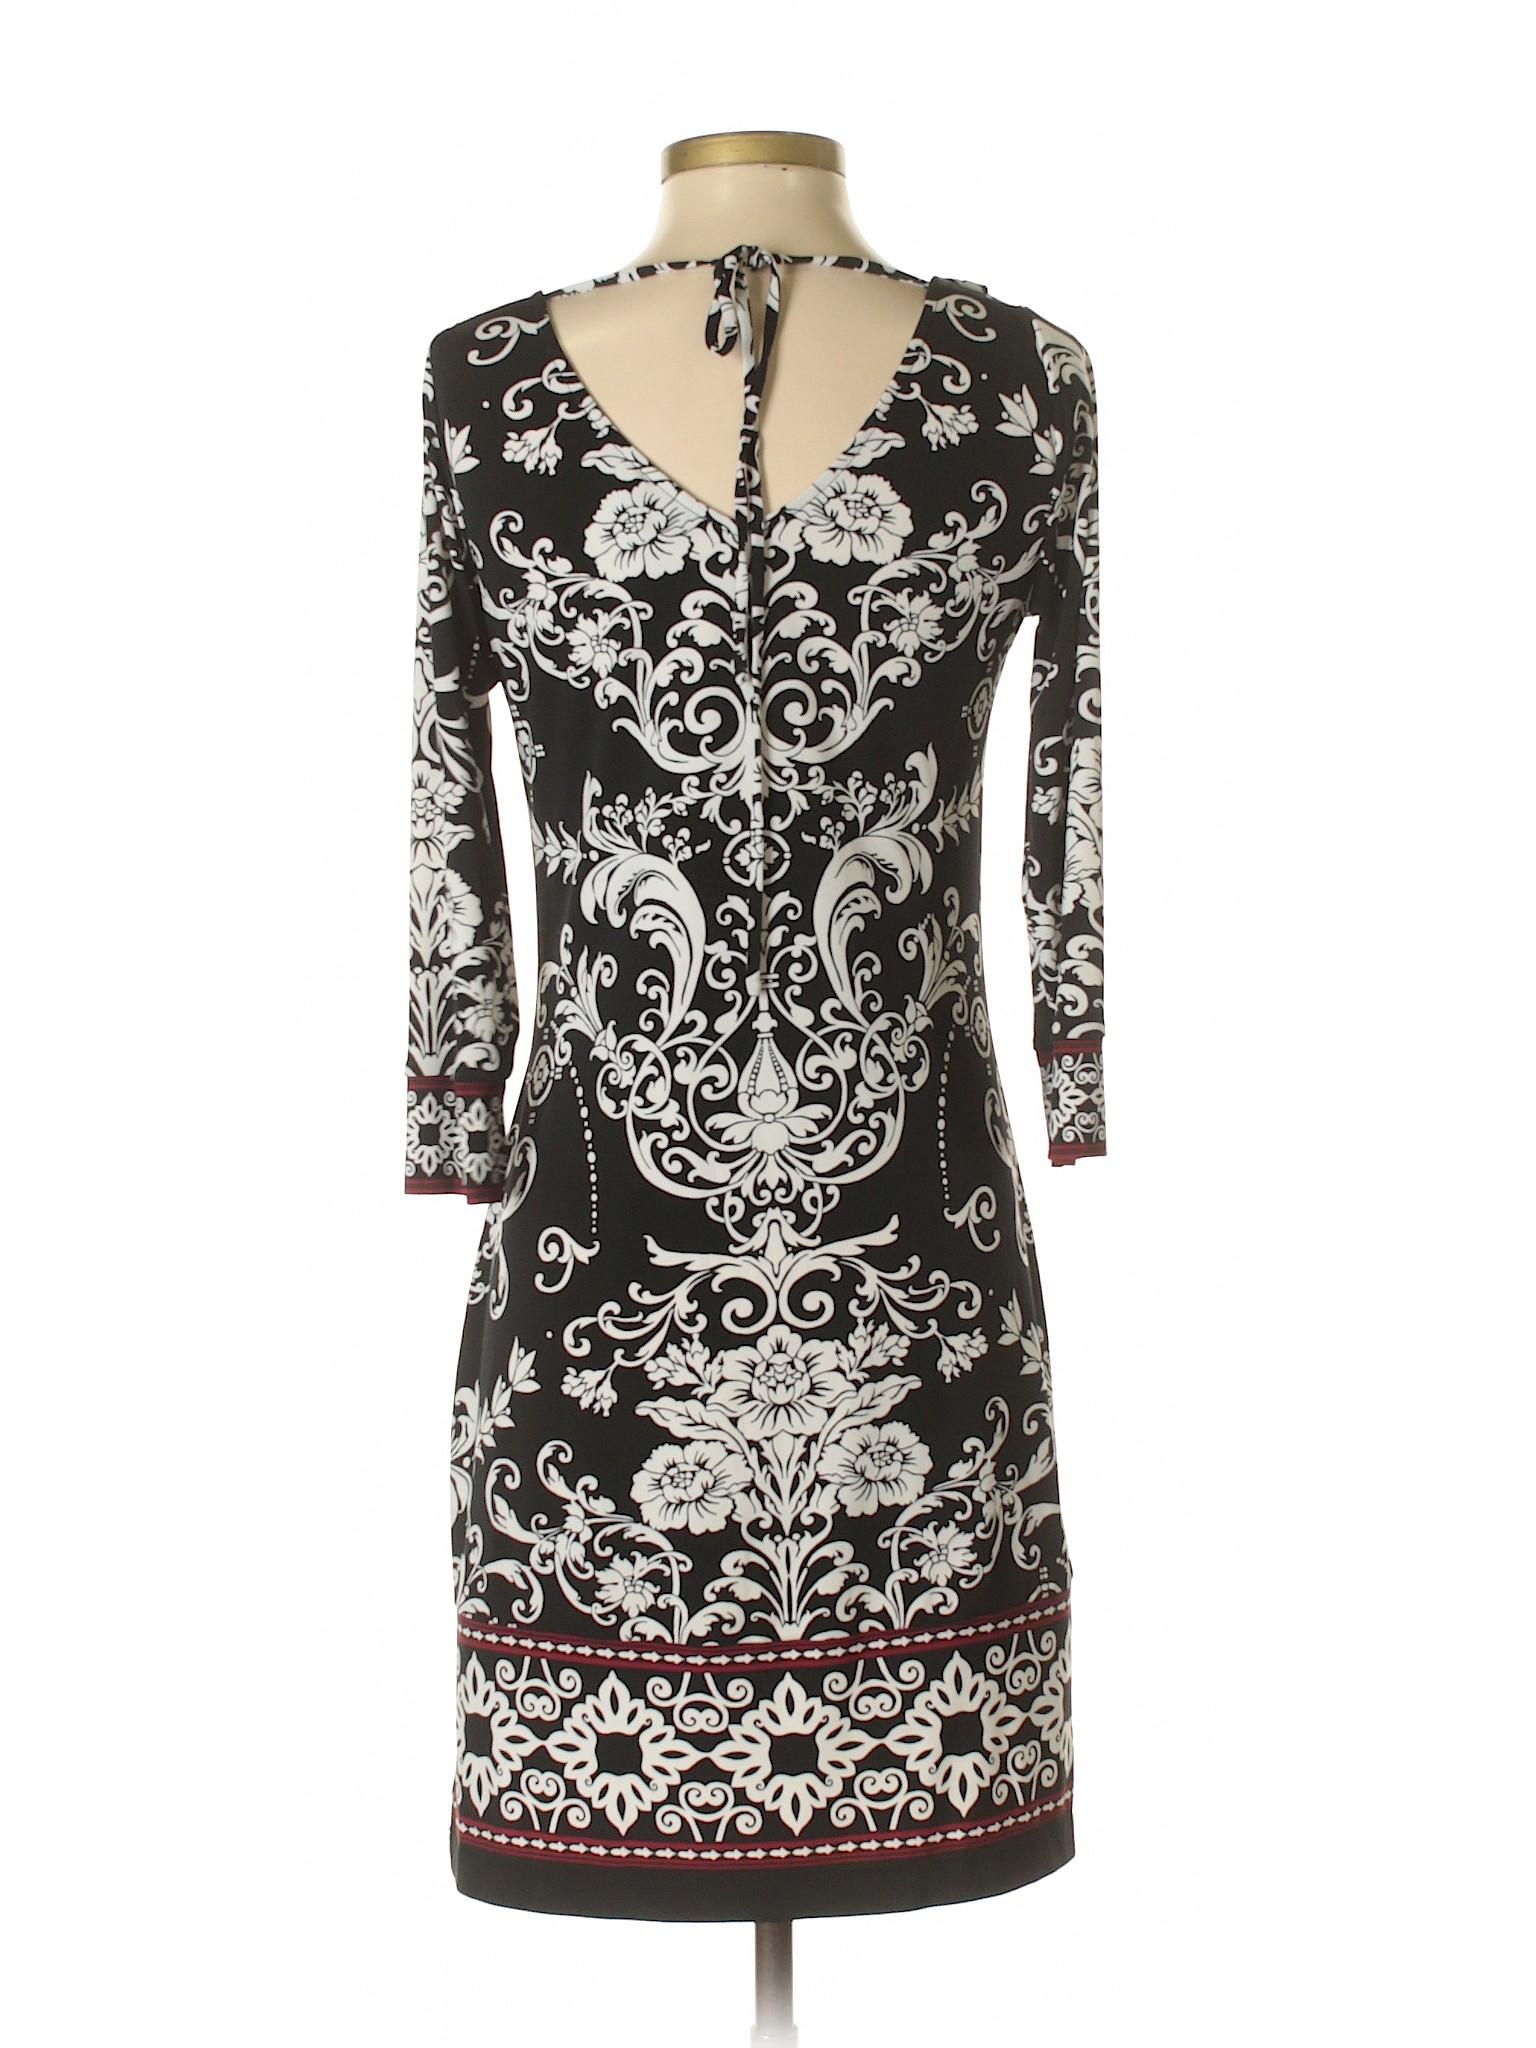 Dress winter Black White House Boutique Market Casual 0Uqzw8S